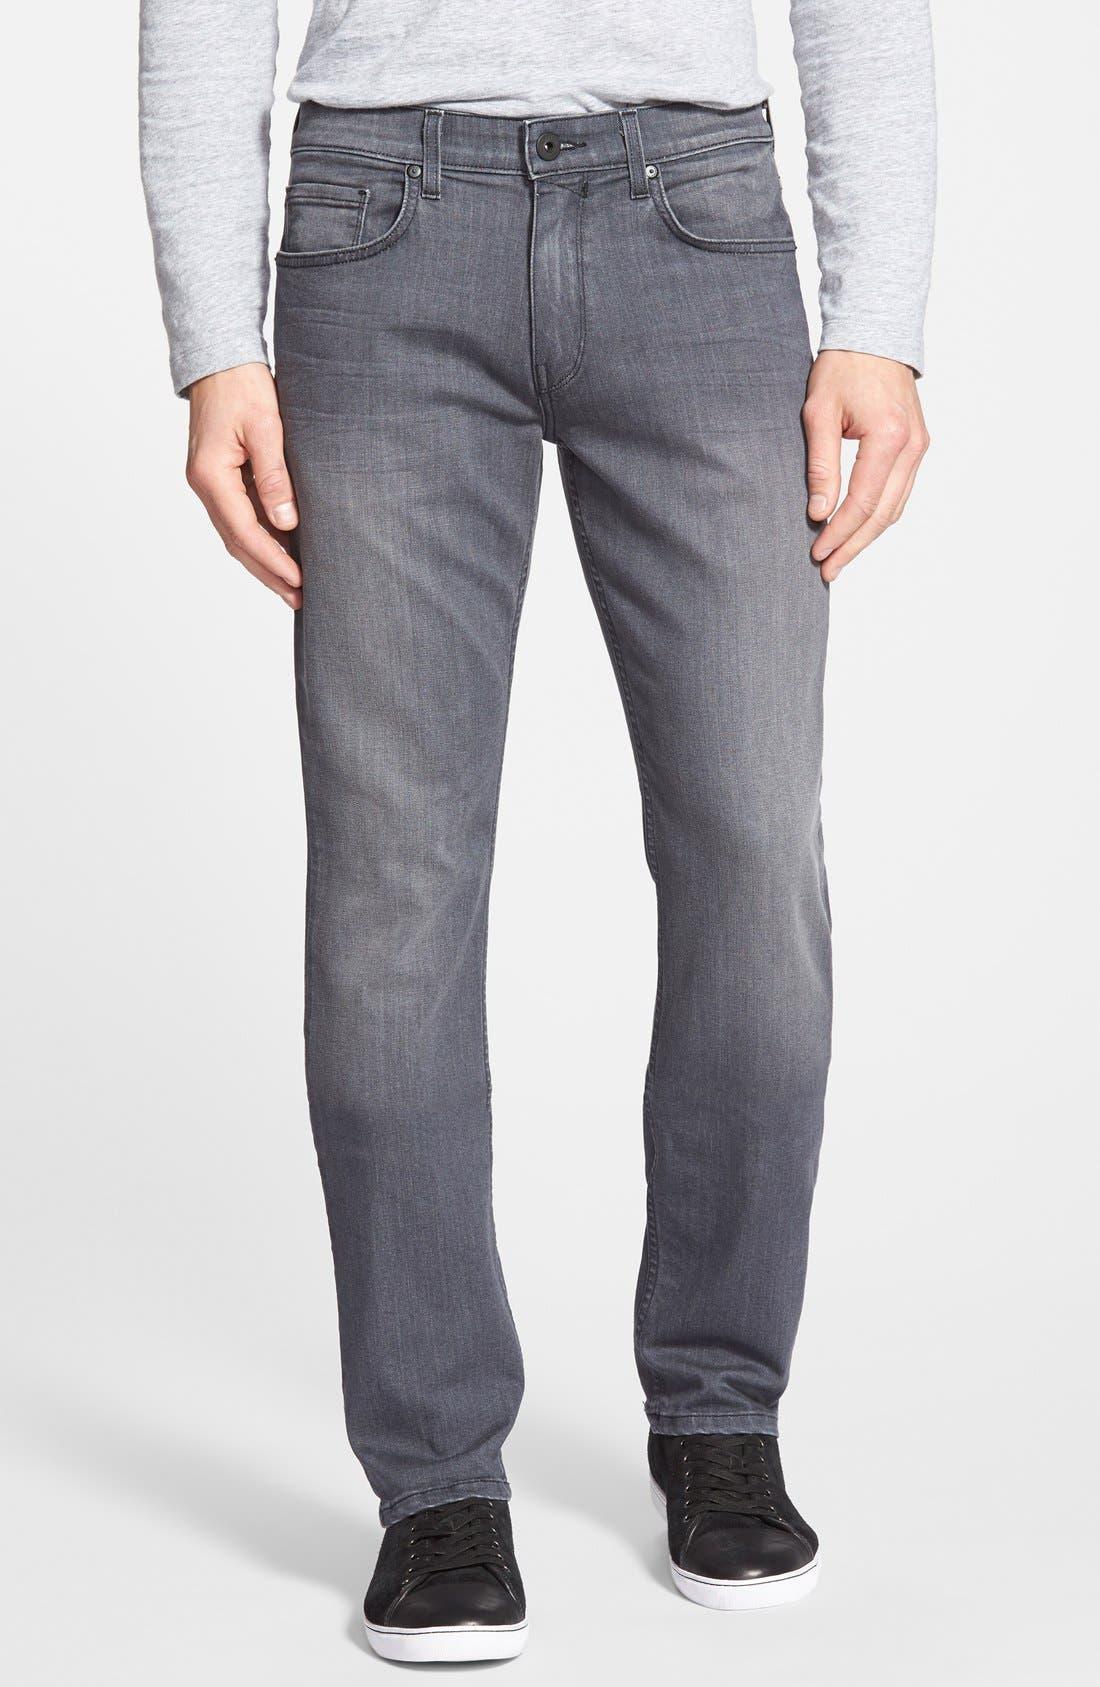 PAIGE Federal XL - TRANSCEND Slim Straight Leg